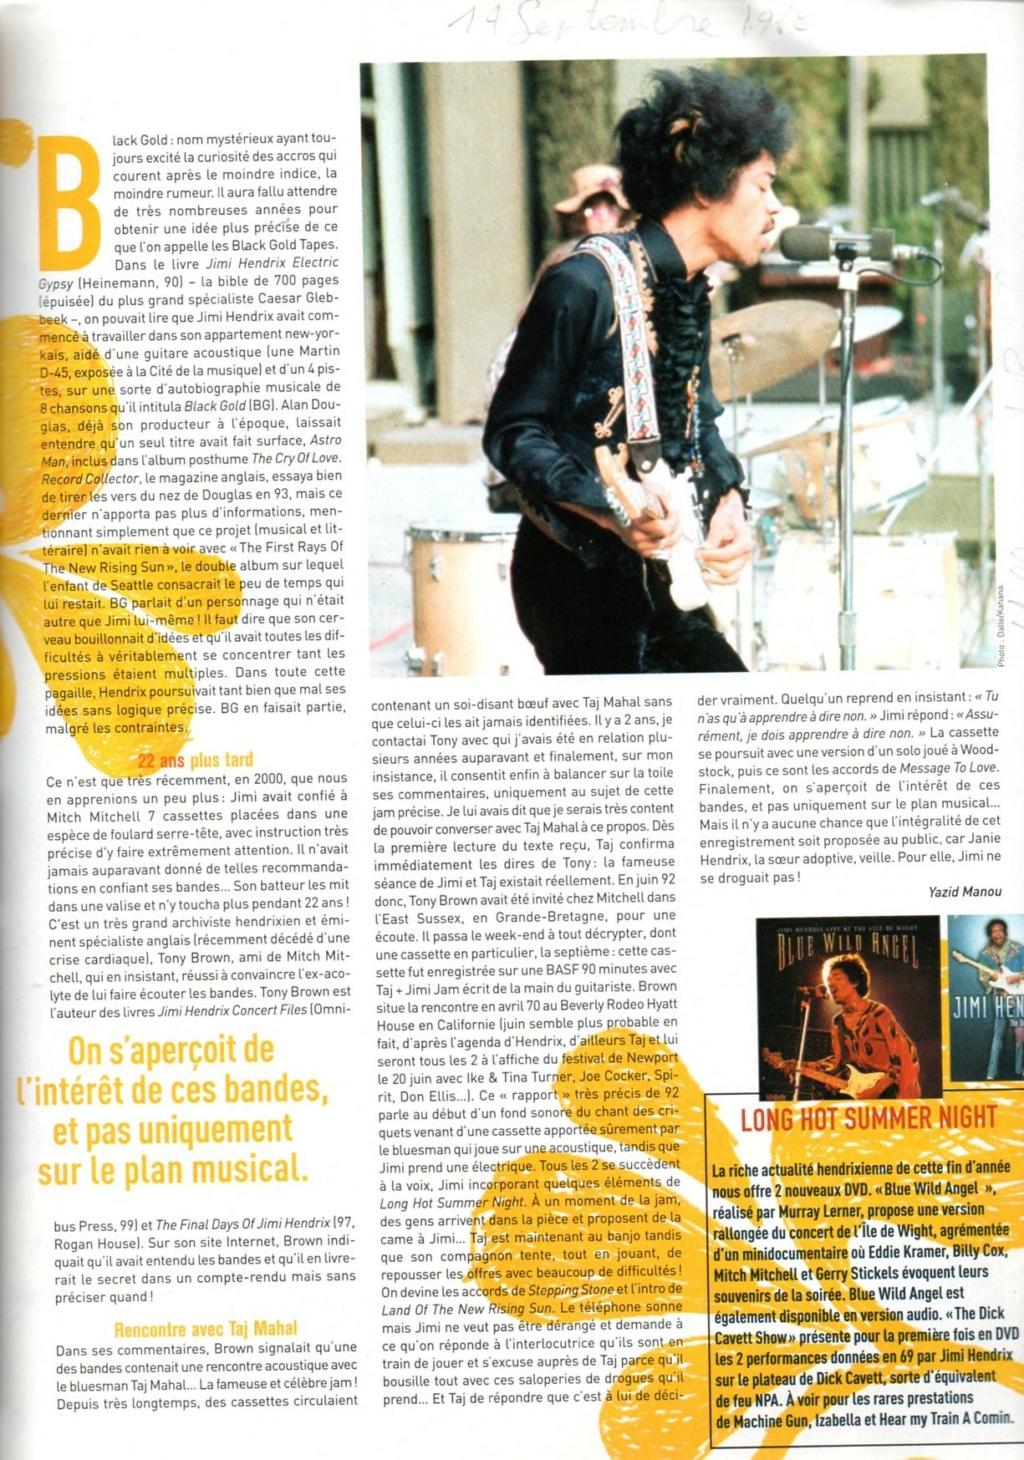 Magazines Français 1989 - 2014 - Page 2 Record18